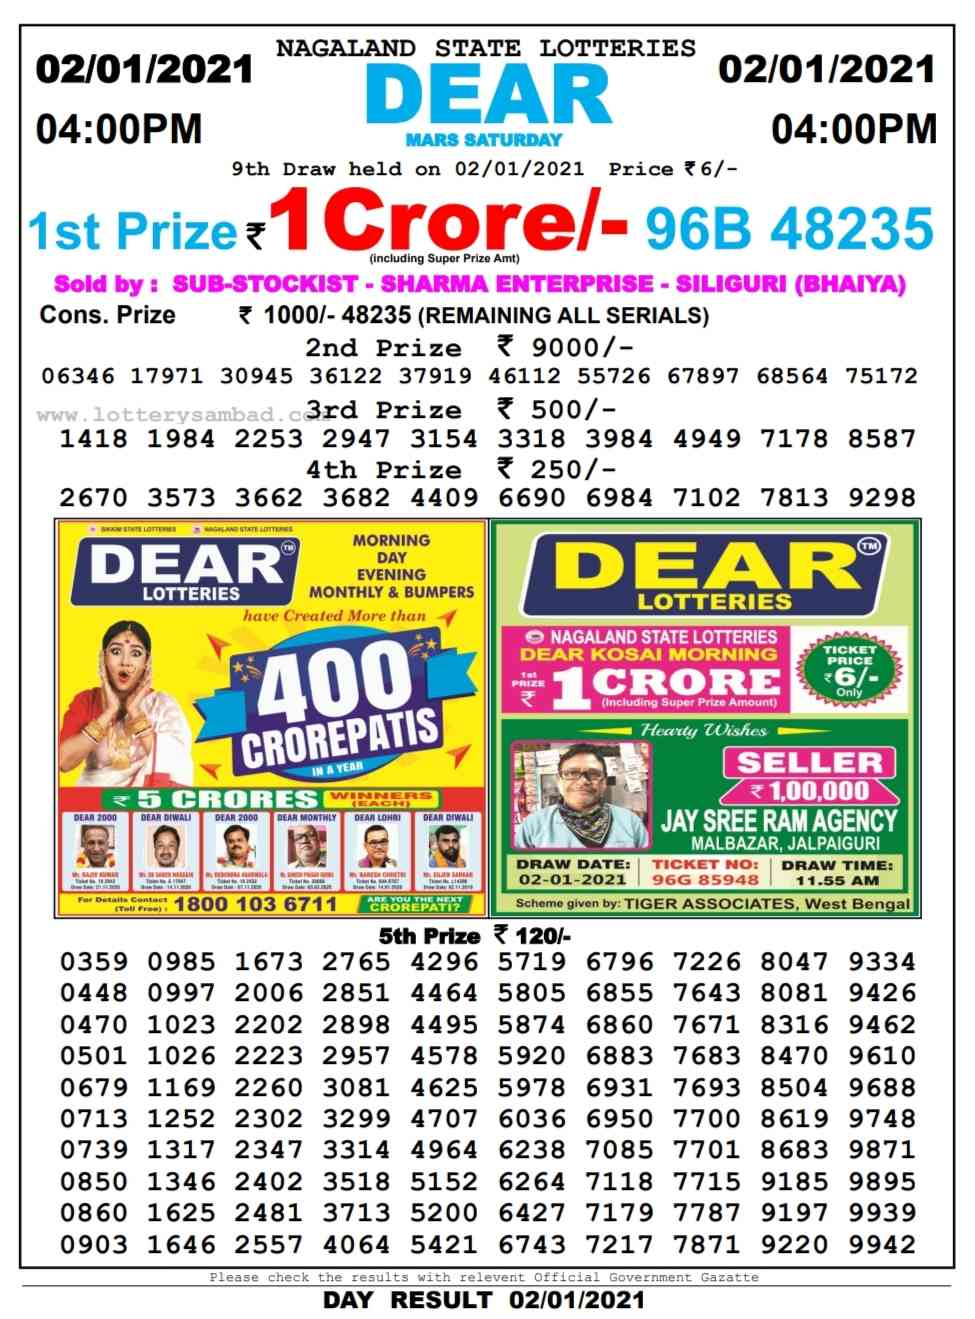 Nagaland Lottery Sambad Result 4 PM on 2.1.2021